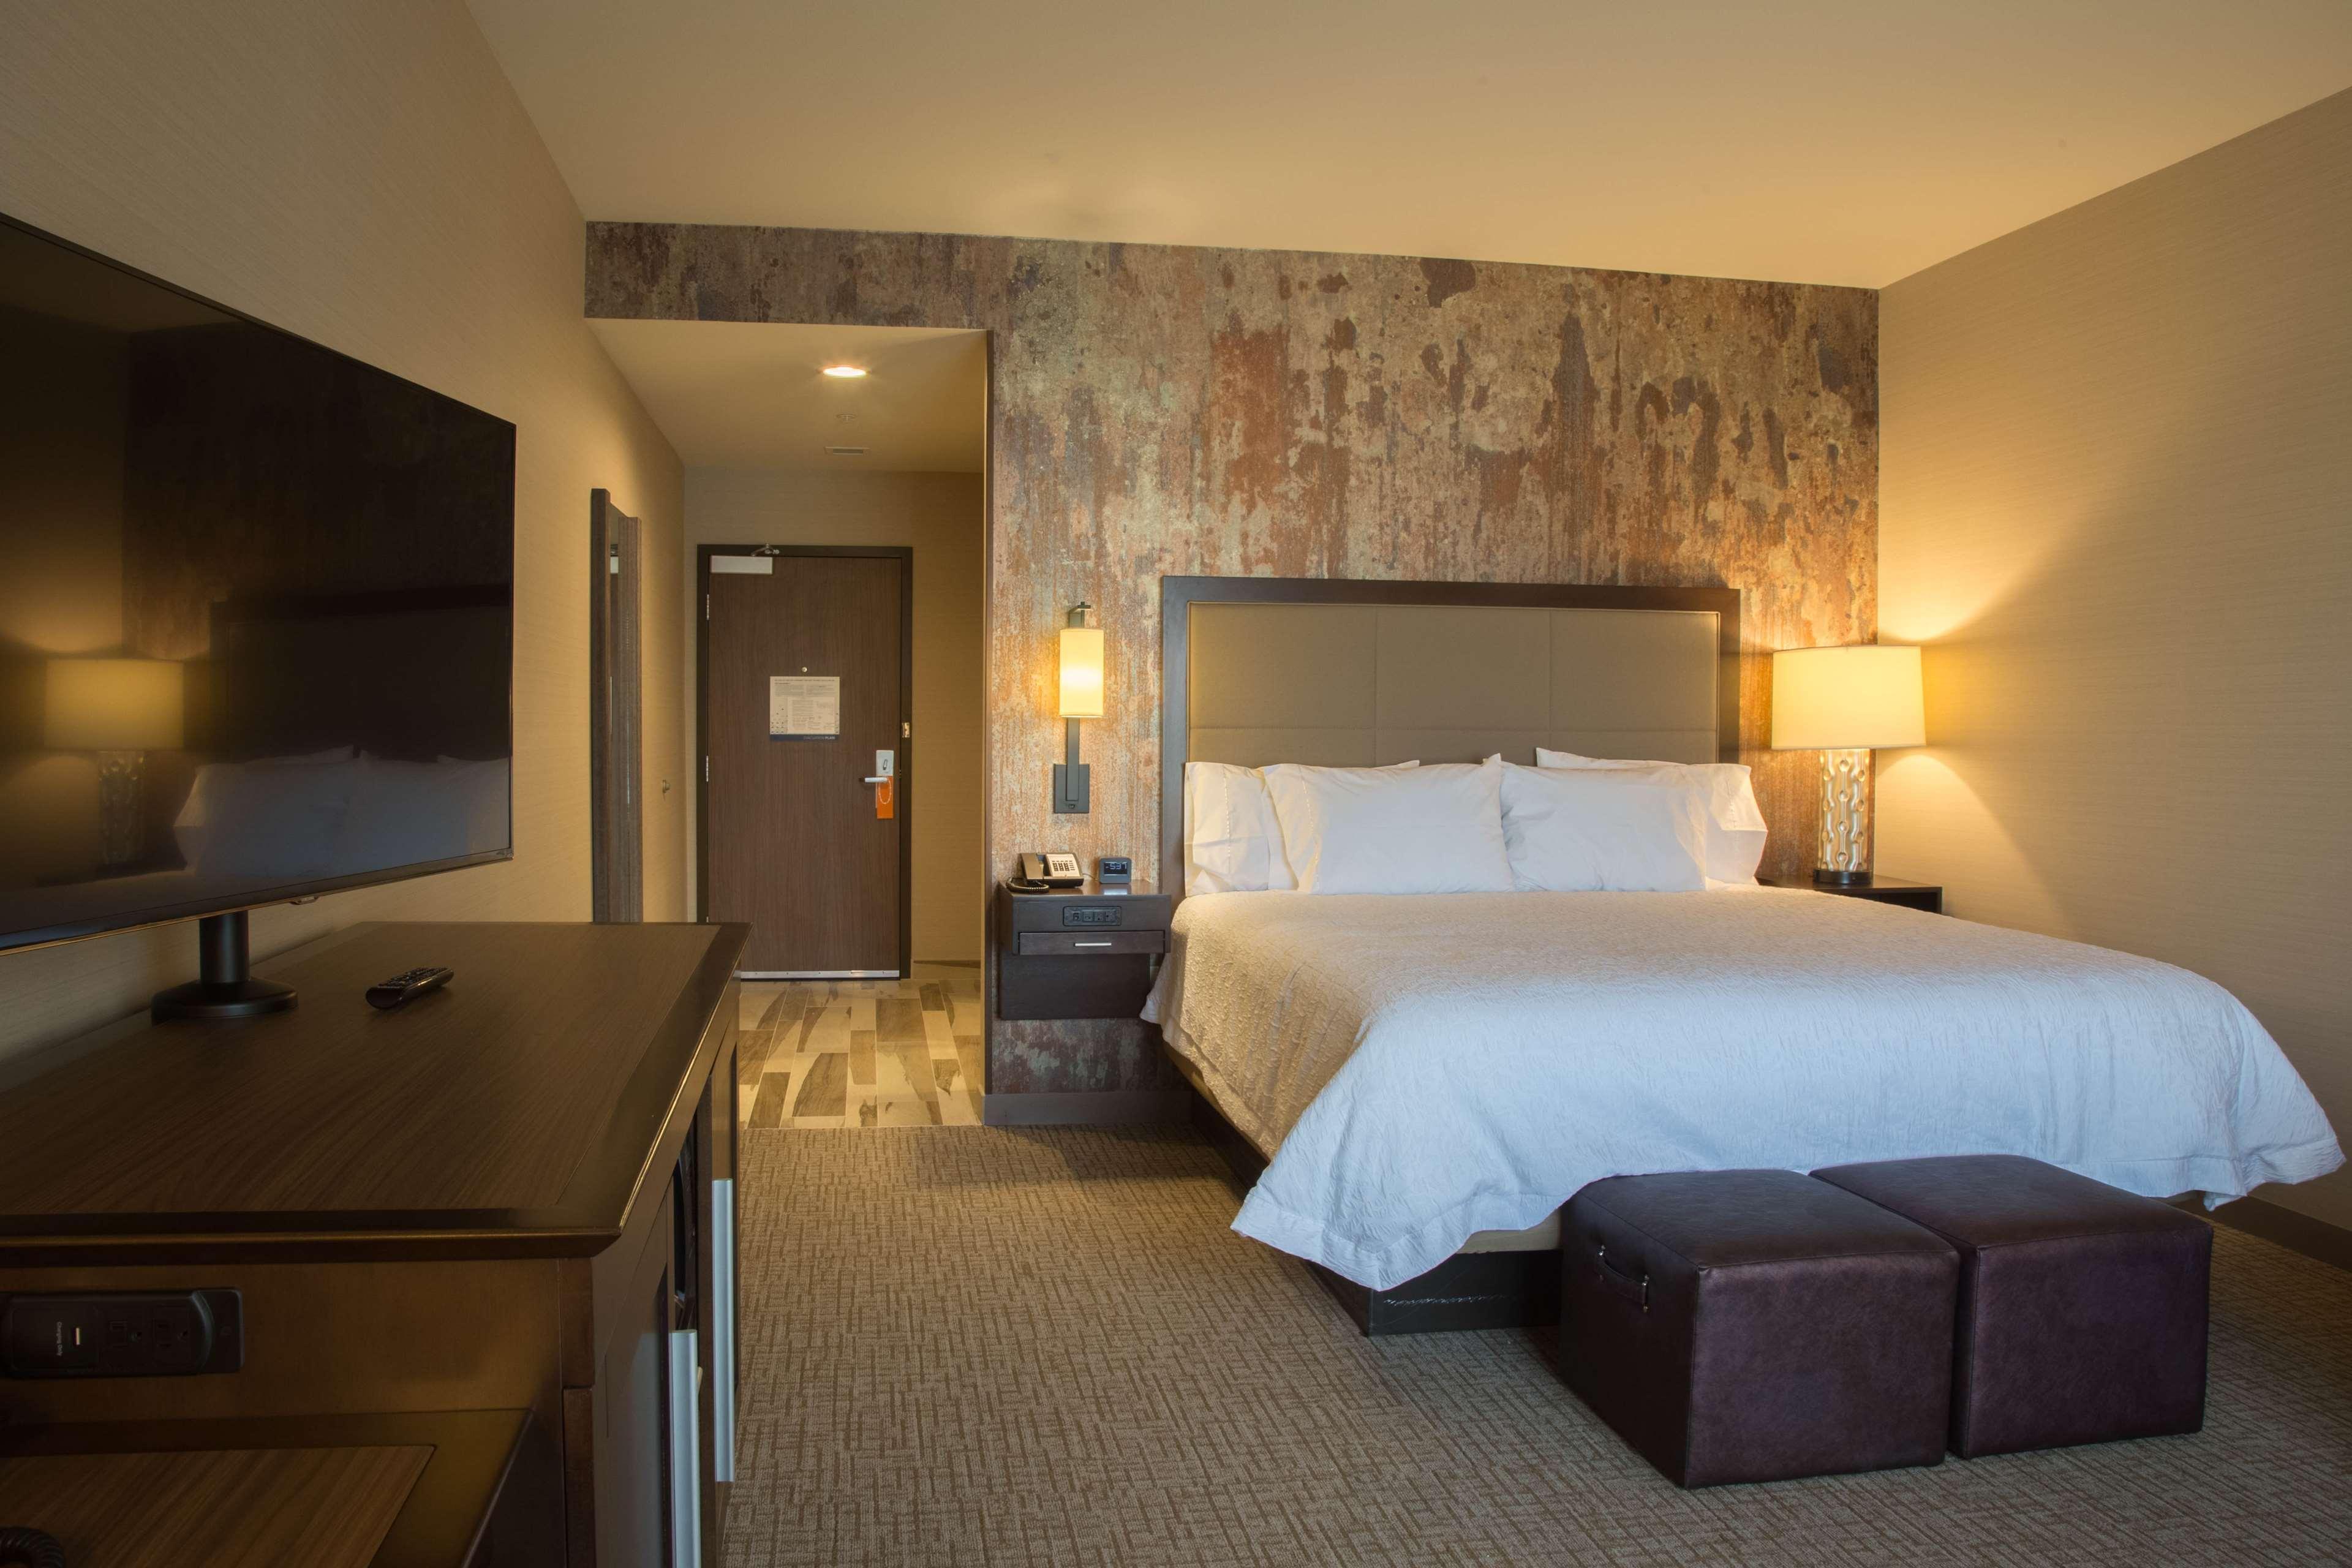 Hampton Inn & Suites Murrieta Temecula image 19